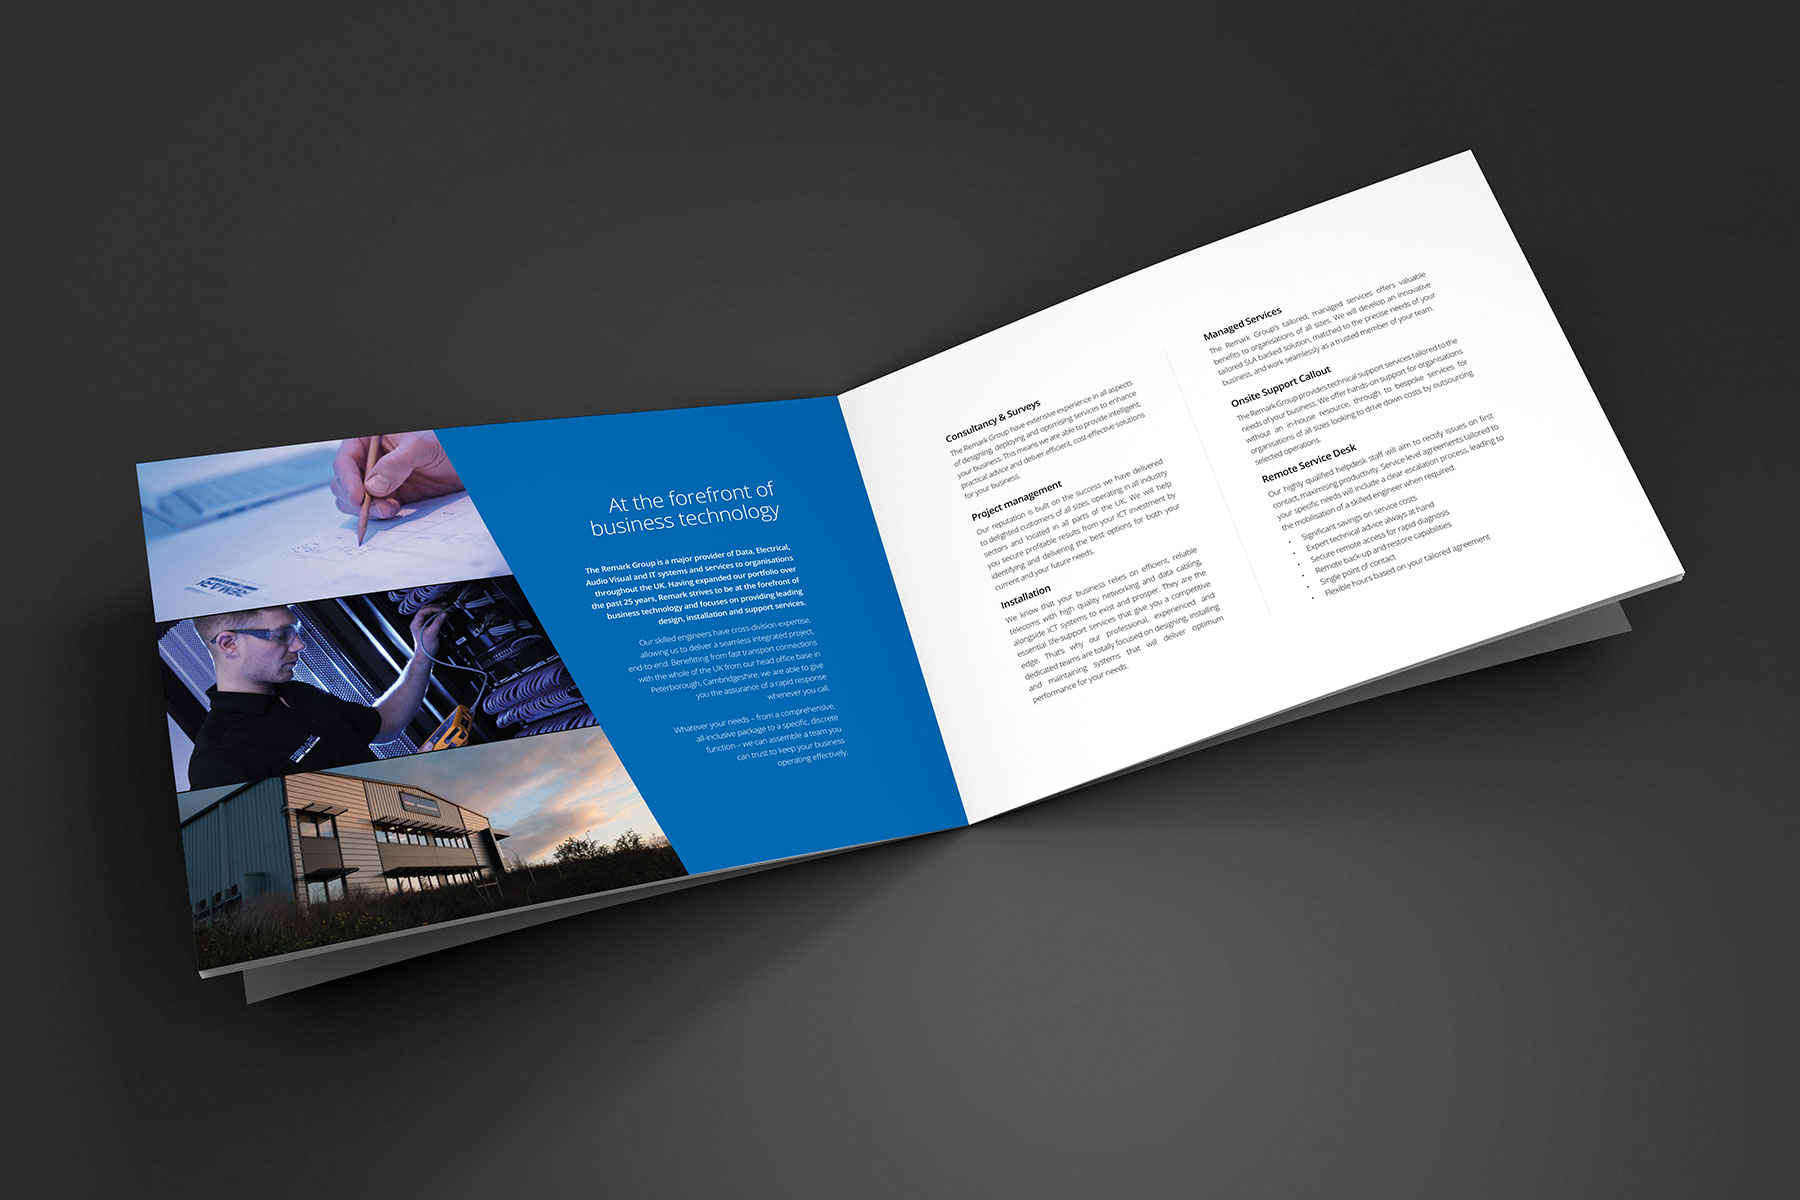 Brochure design pages for Remark branding